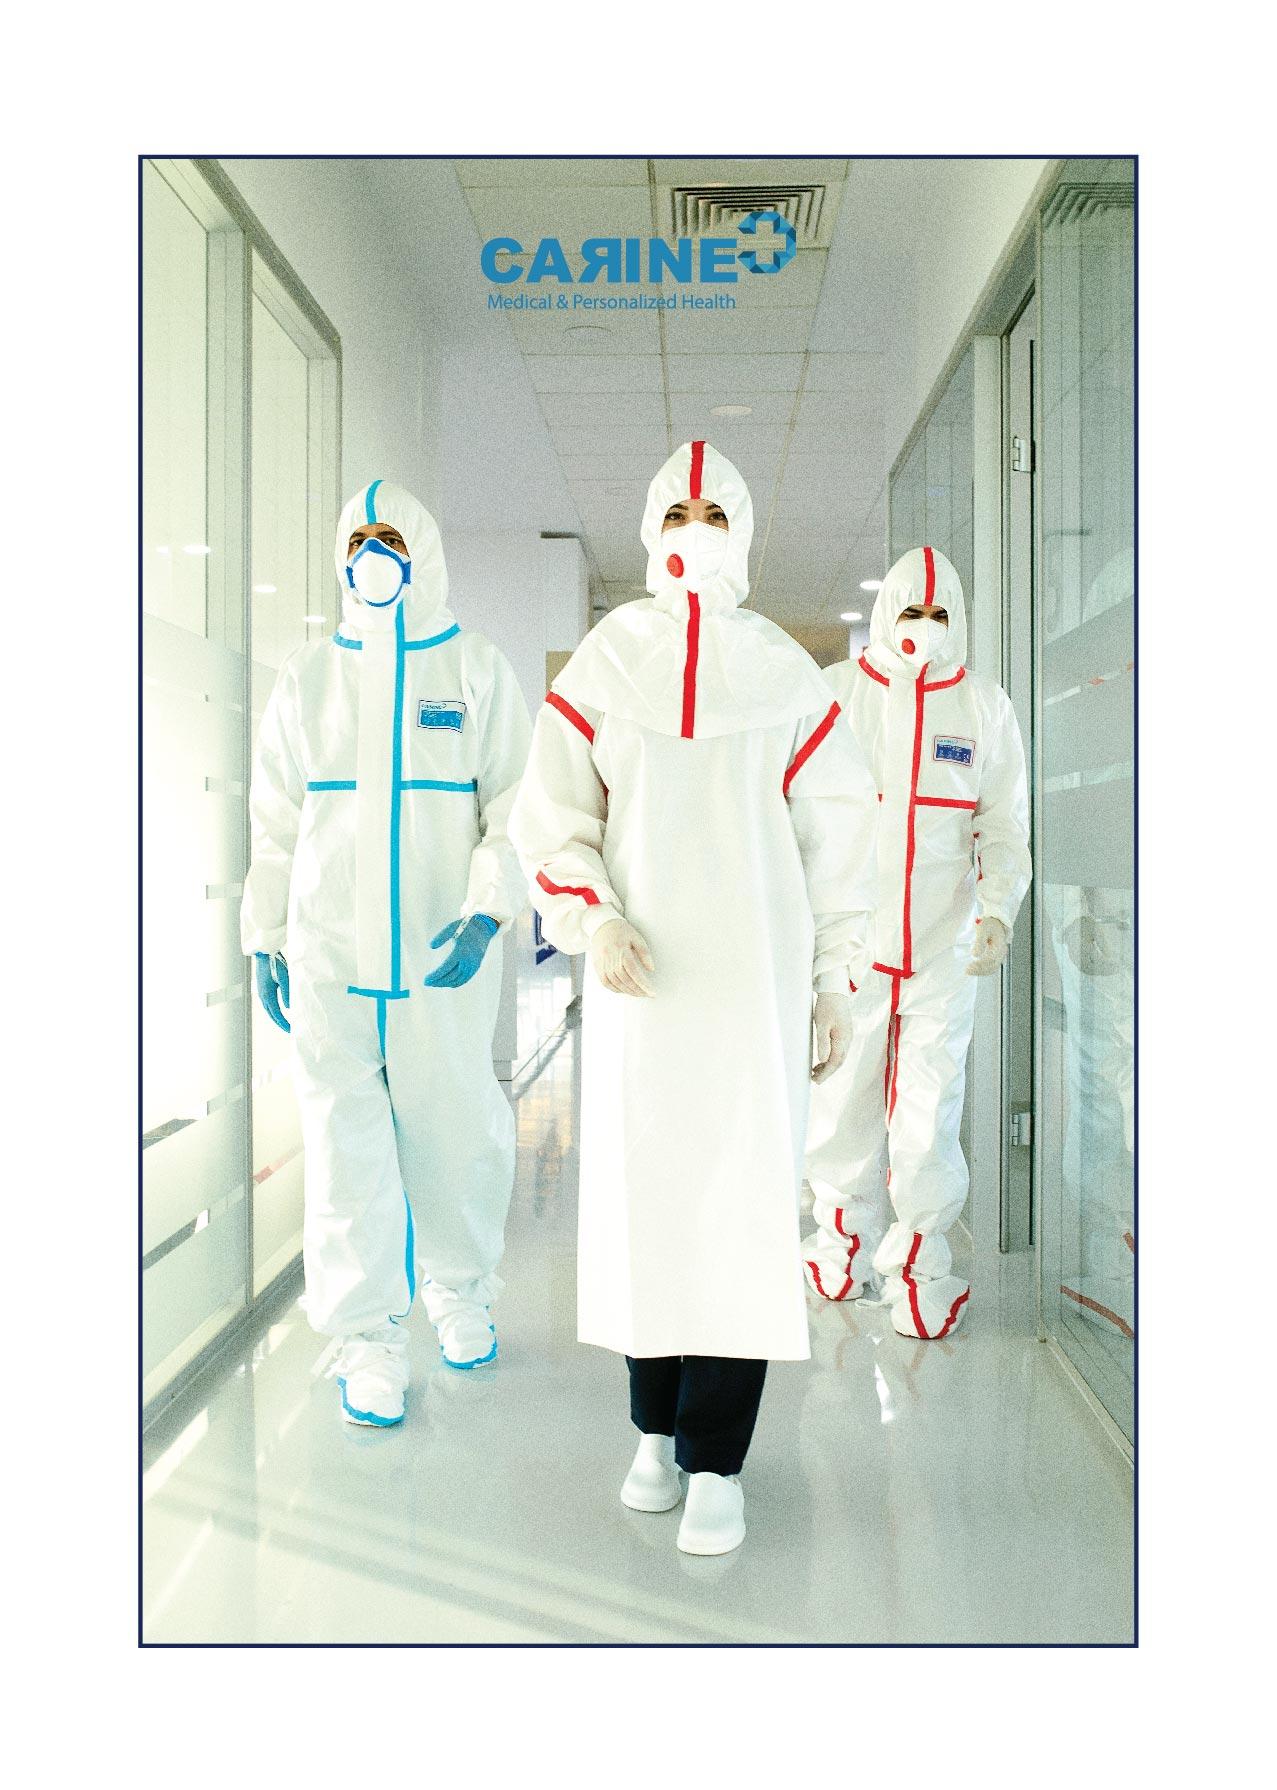 2. CARINE MEDICAL COVID-19 LINE-51